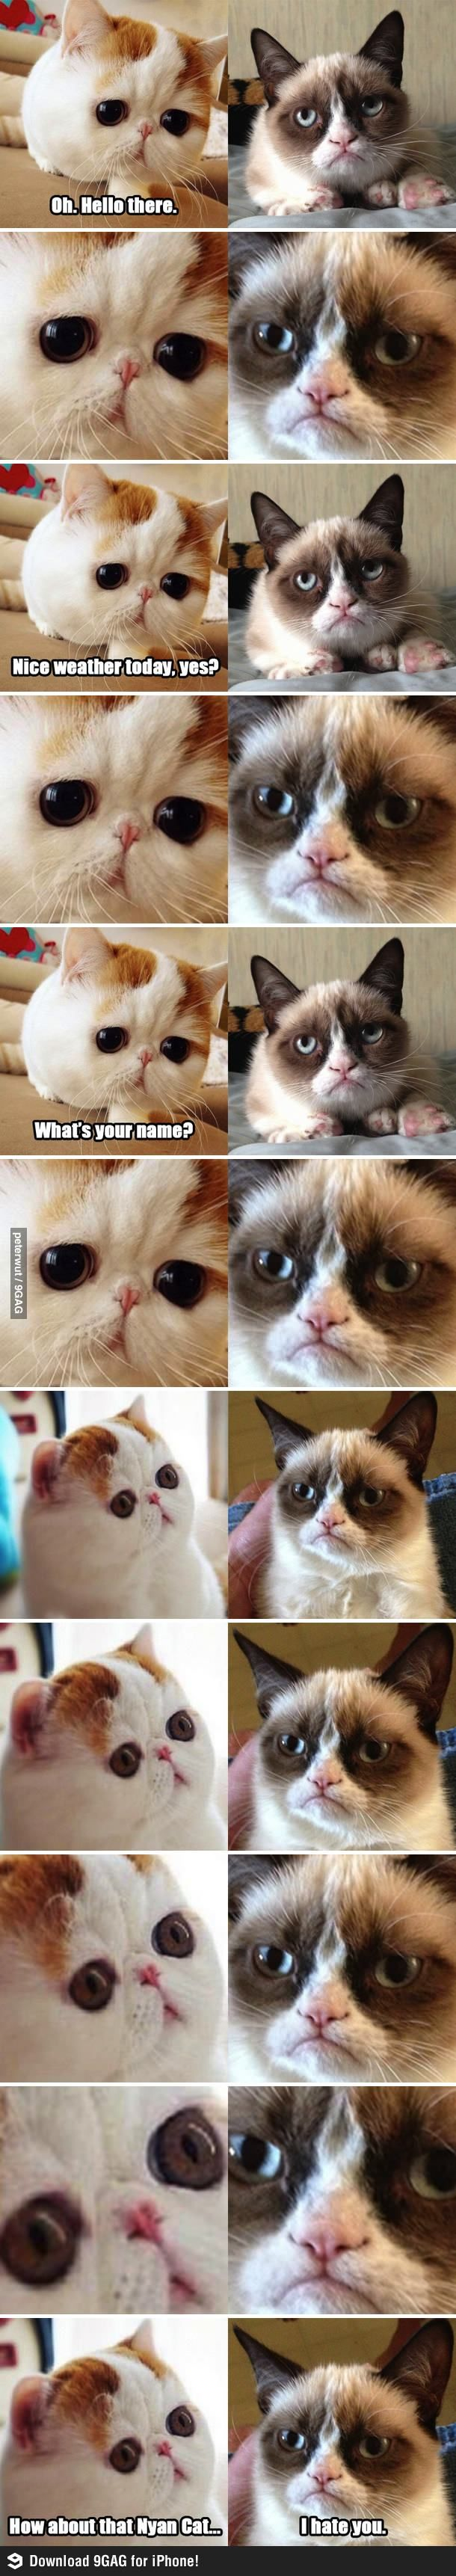 Snoopy vs Grumpy cat